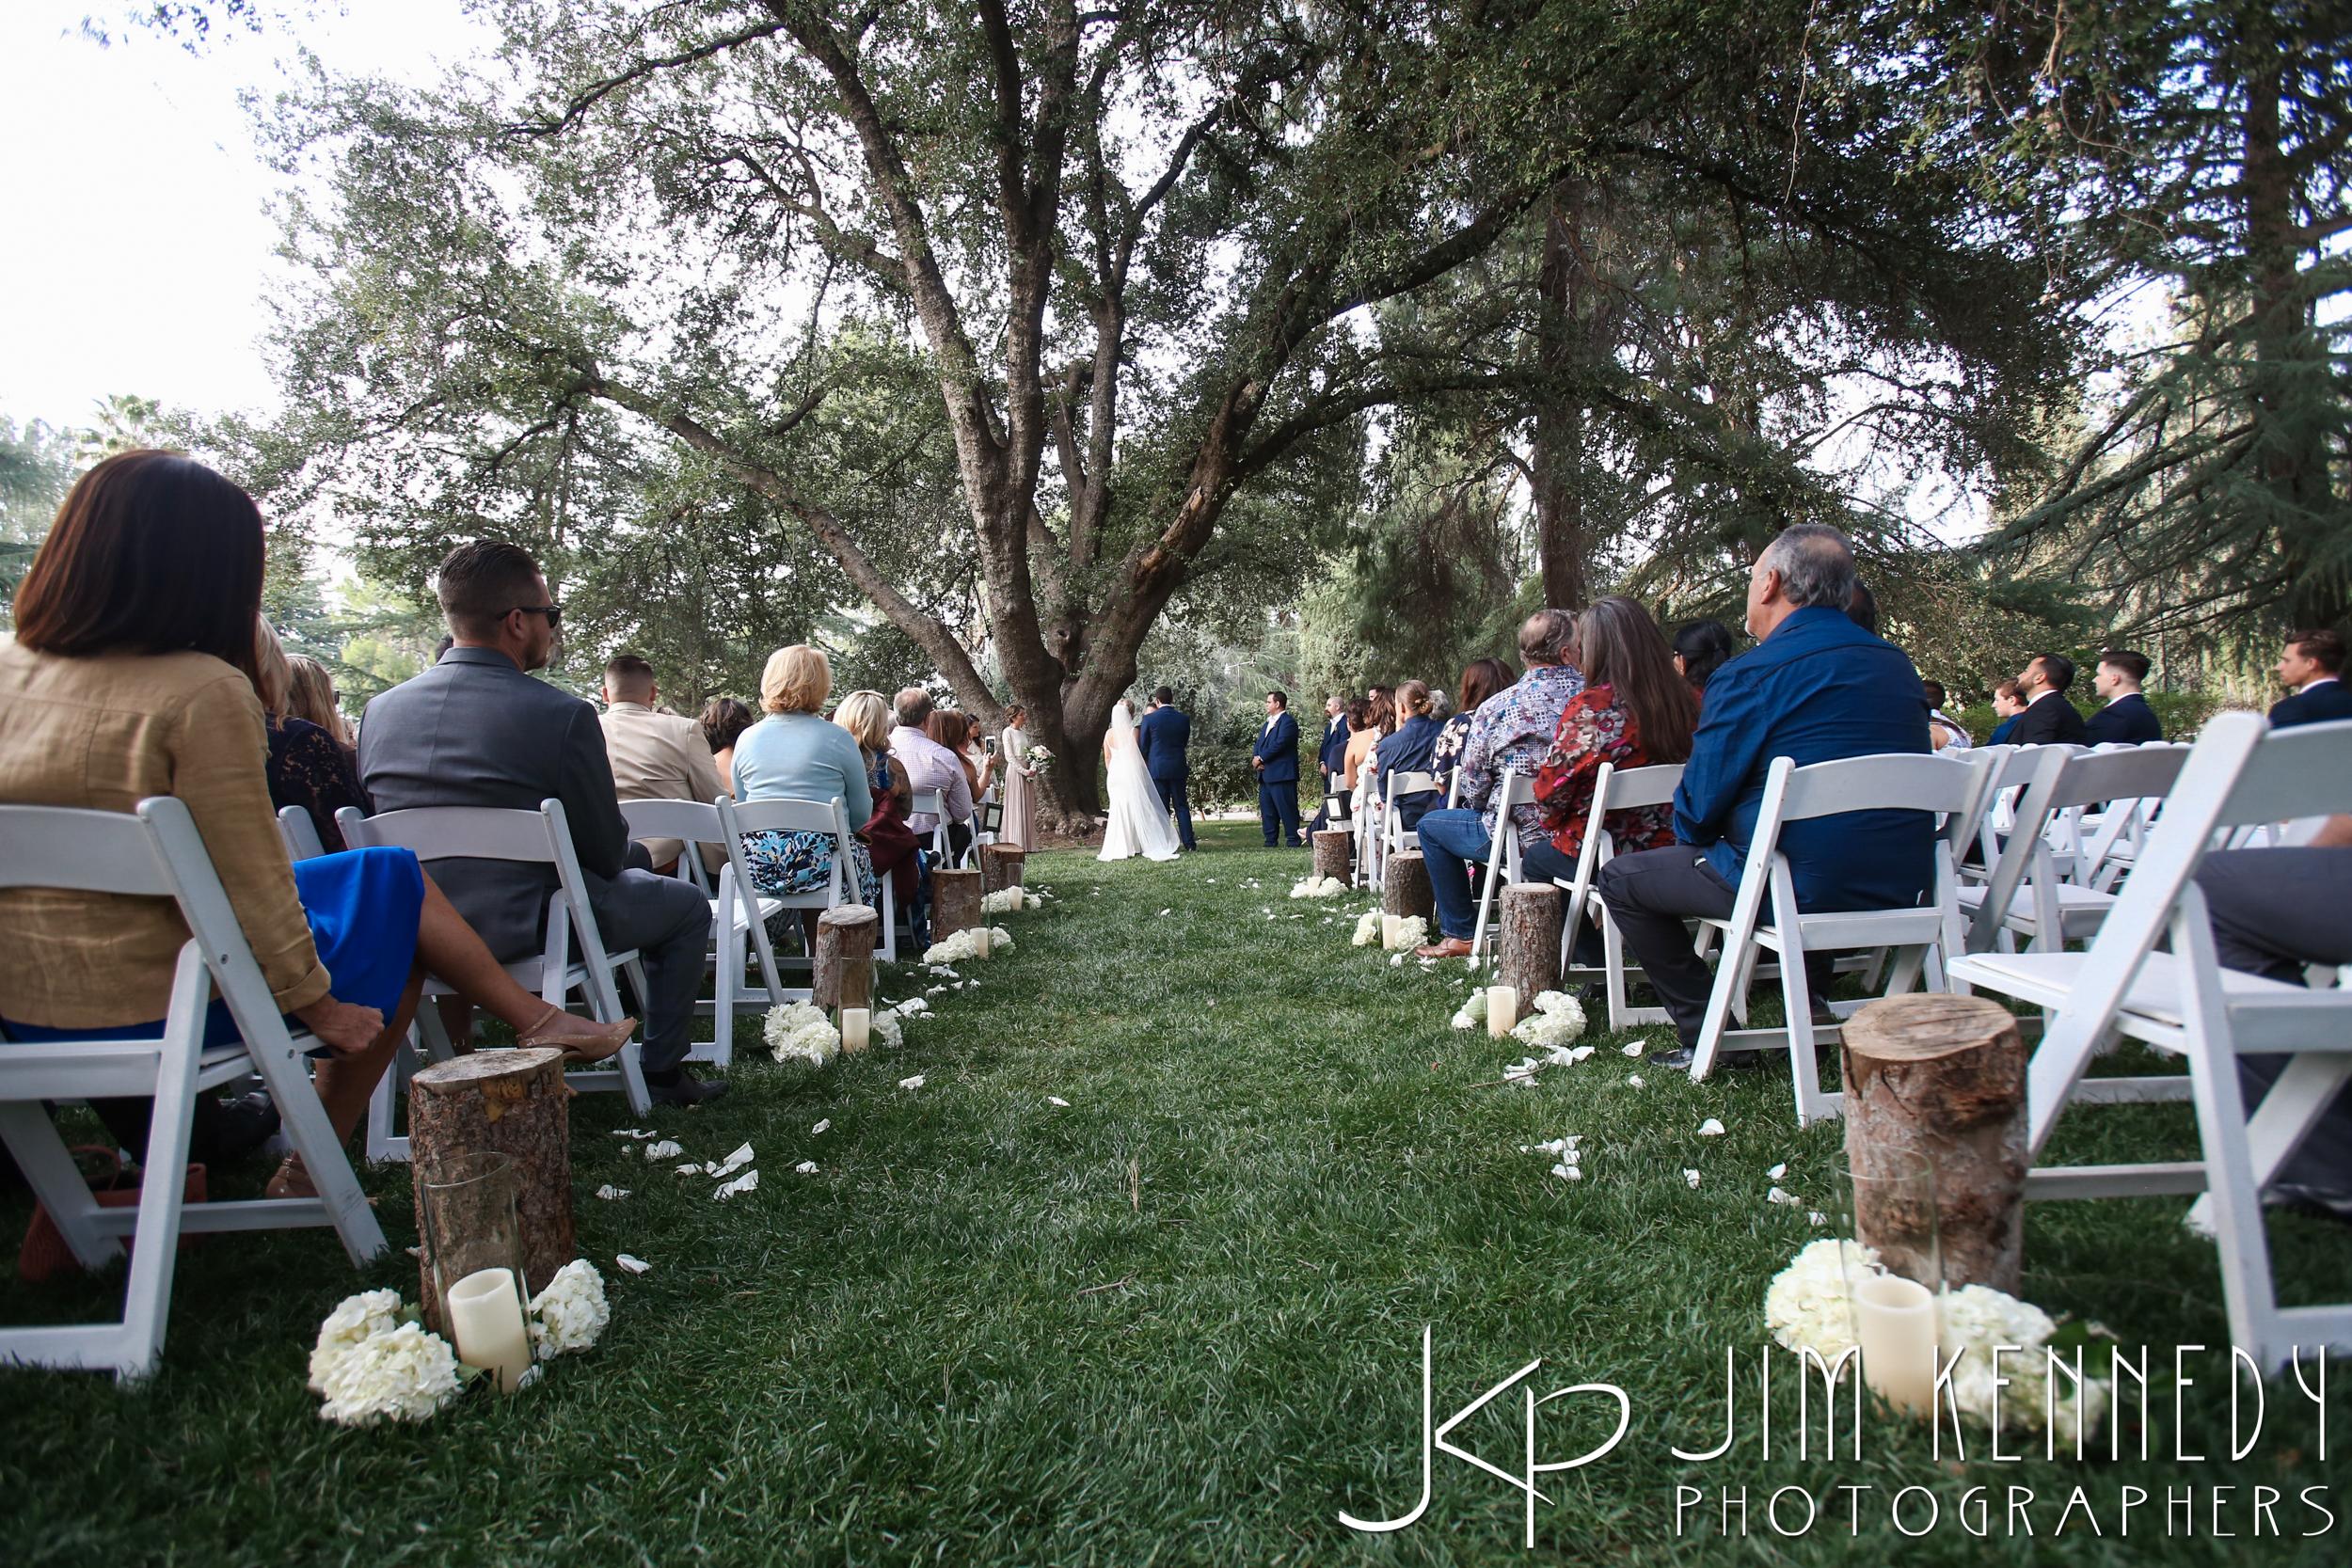 jim_kennedy_photographers_highland_springs_wedding_caitlyn_0082.jpg